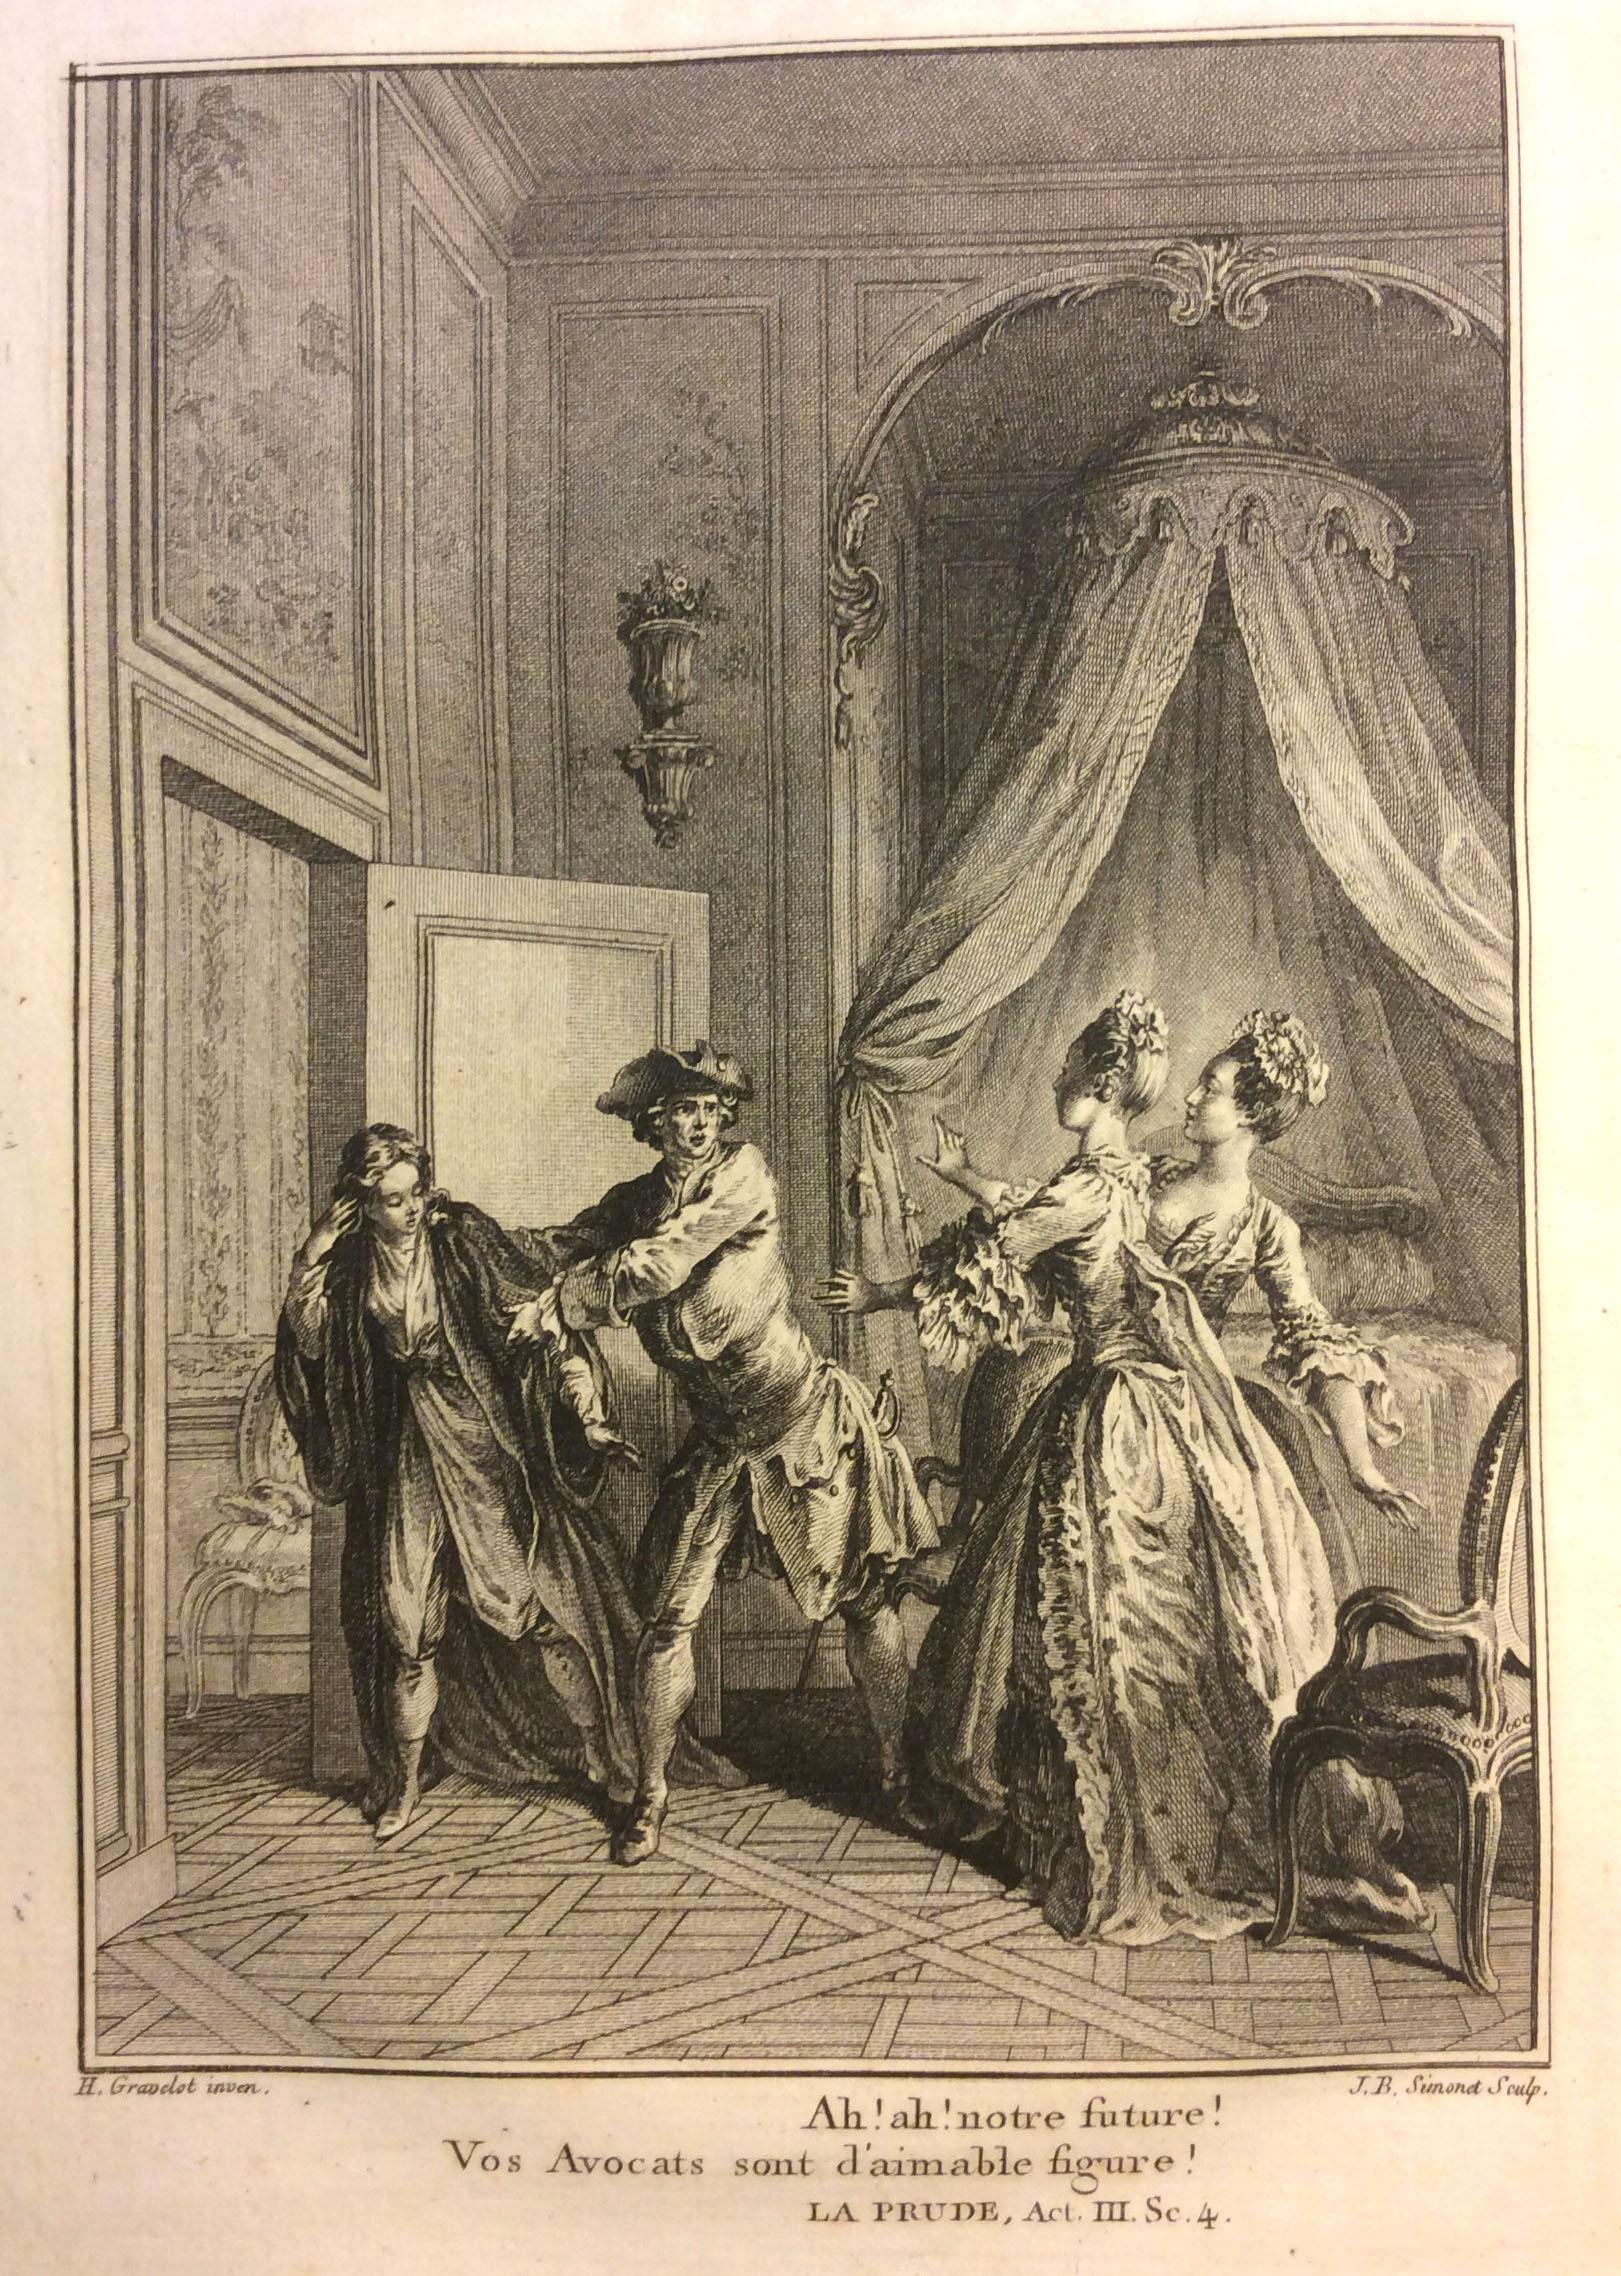 Adine dressed as a Greek boy in La Prude, in Collection complète des œuvres de M.de Voltaire, 1768.